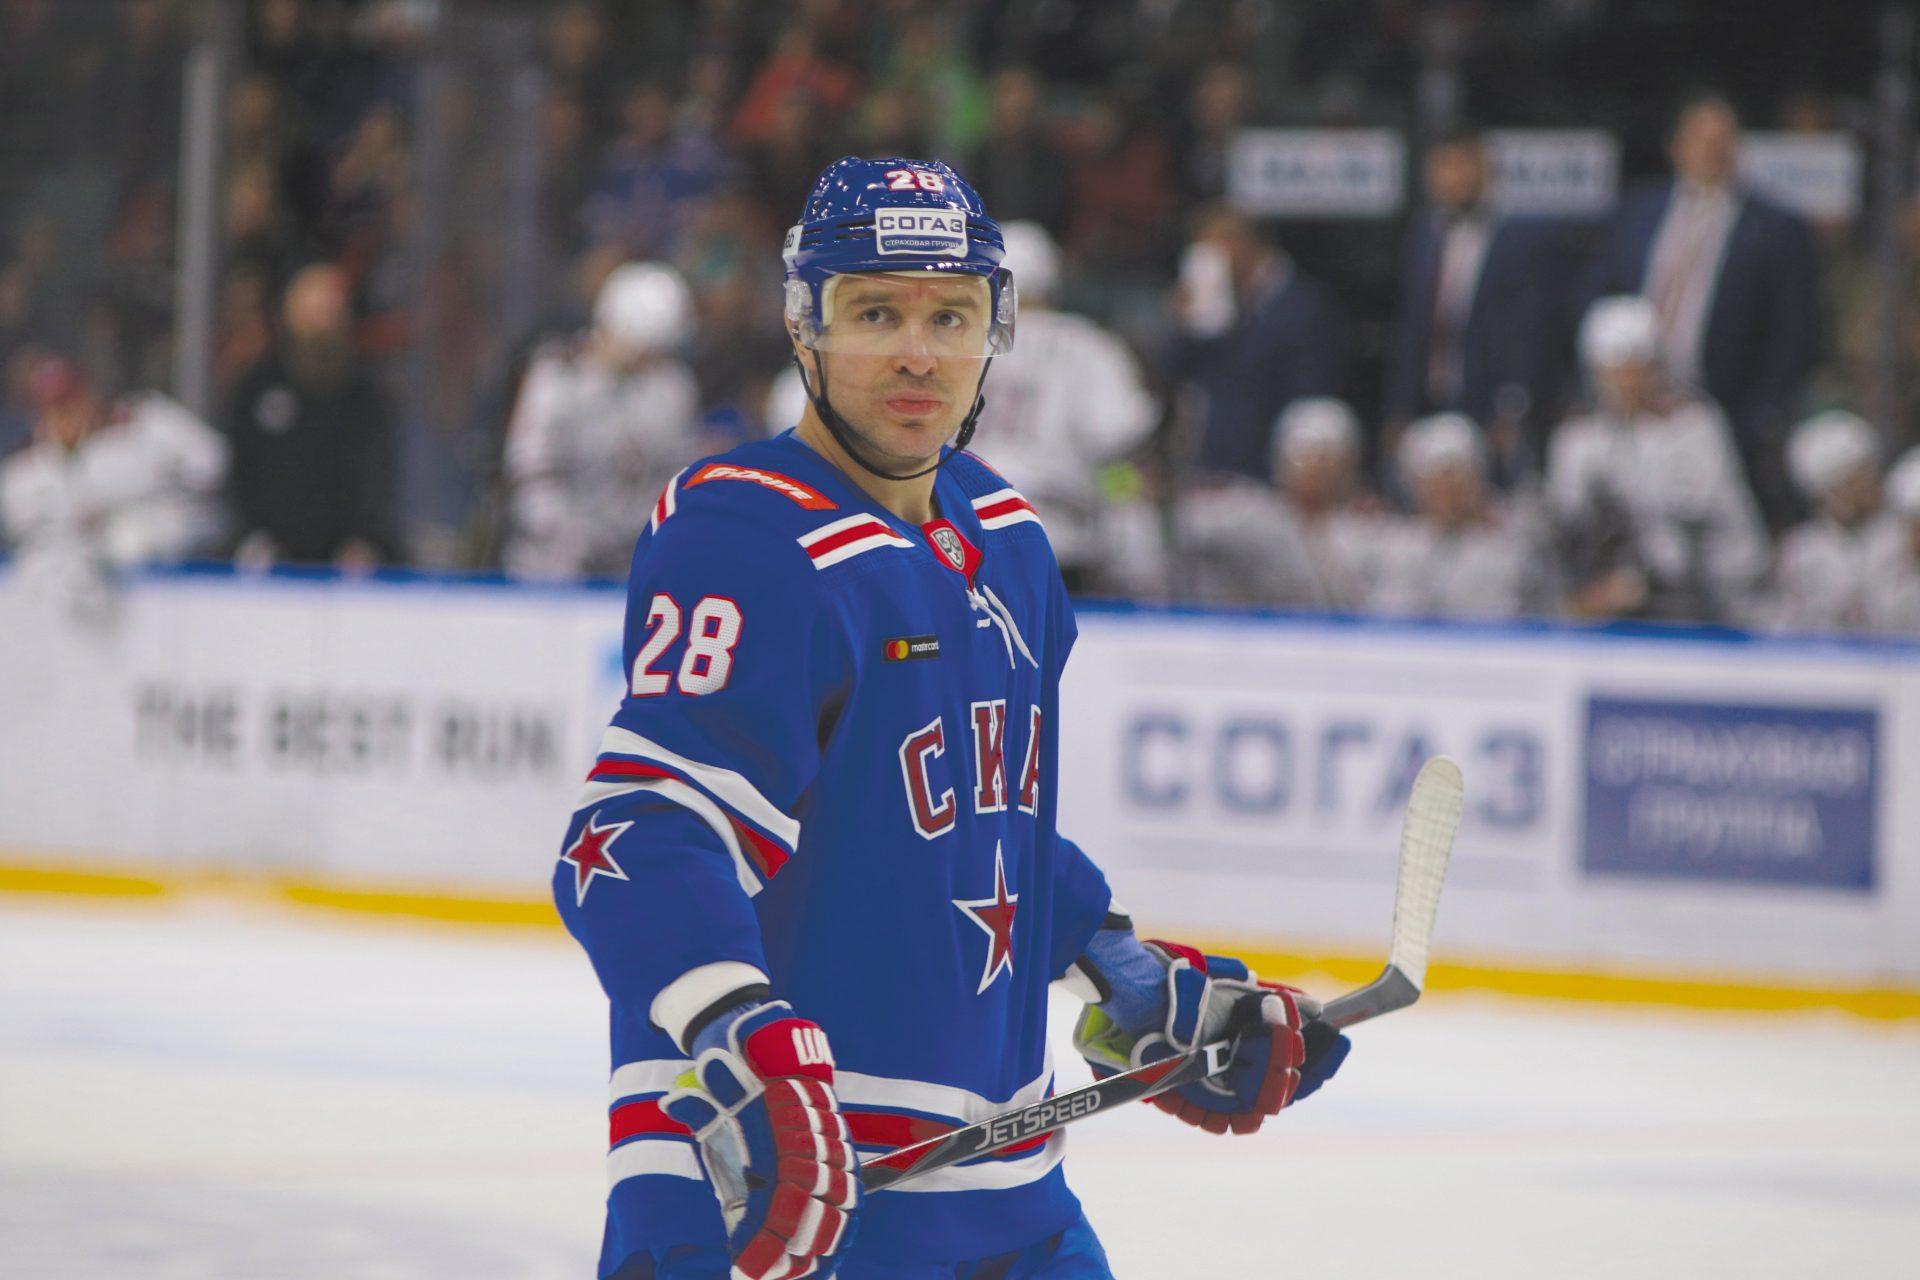 Andrey Zubarev